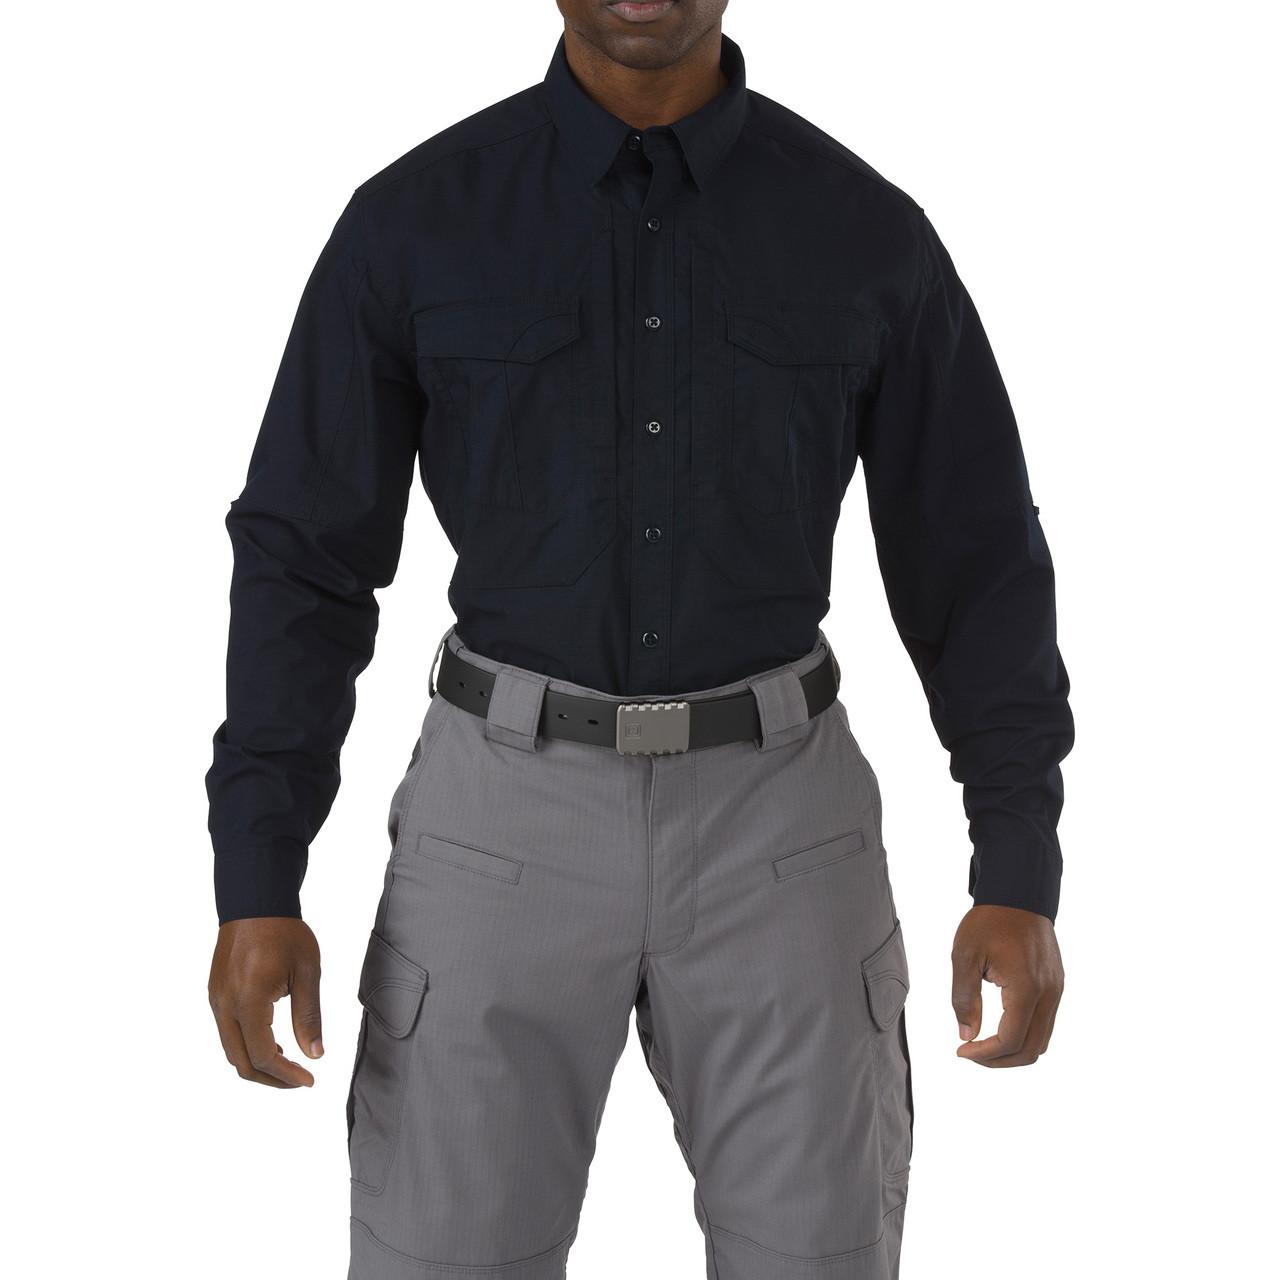 72399: Stryke Long Sleeve Shirt by 5.11